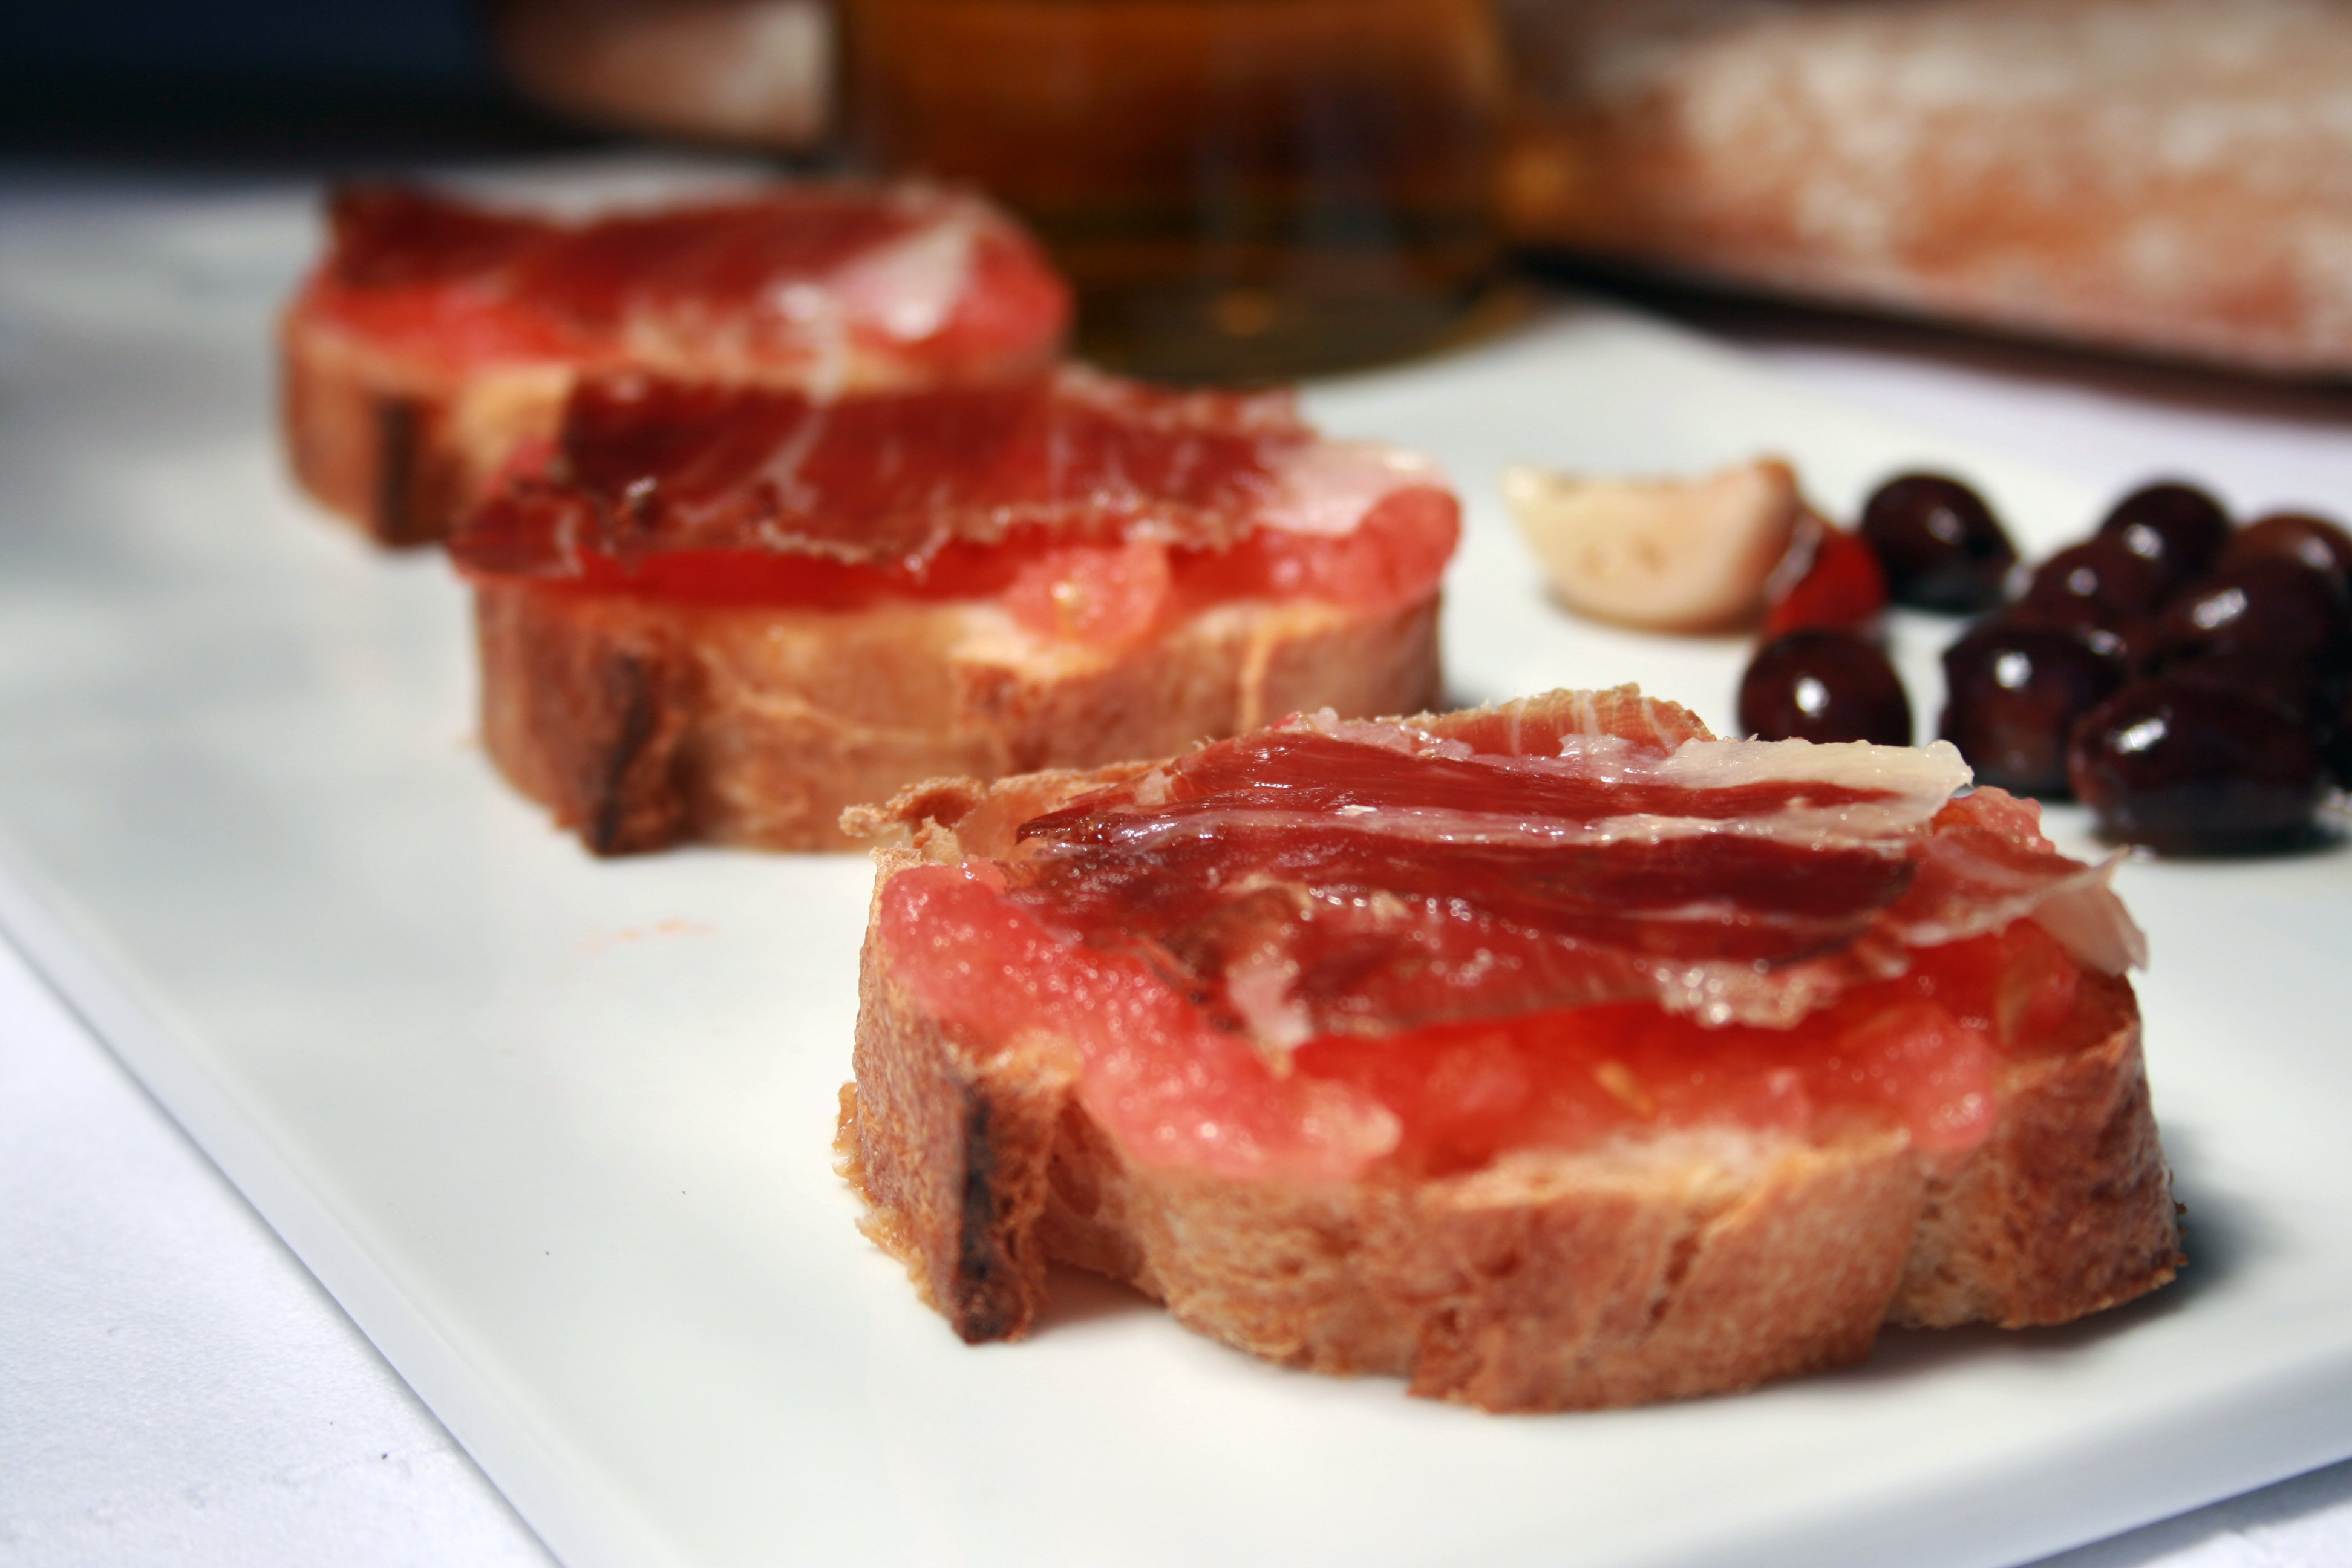 Tomato with Jamon & bread